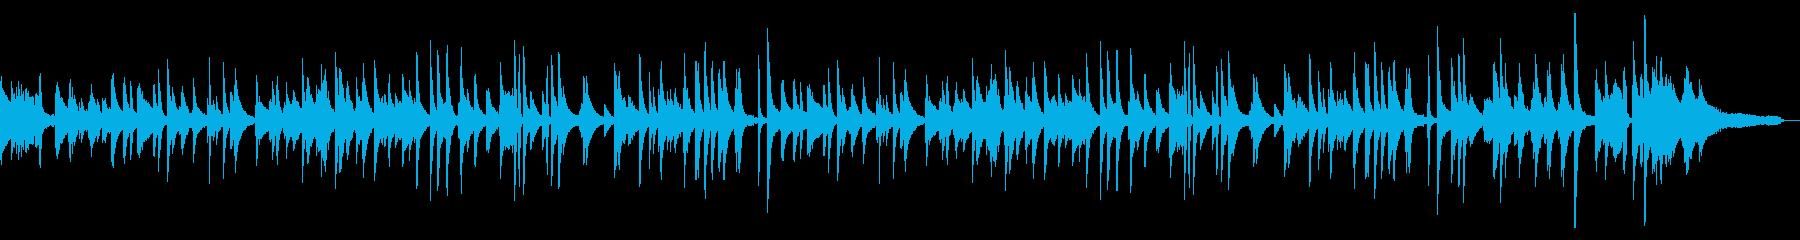 Cool Dreamer_ジャズピアノの再生済みの波形